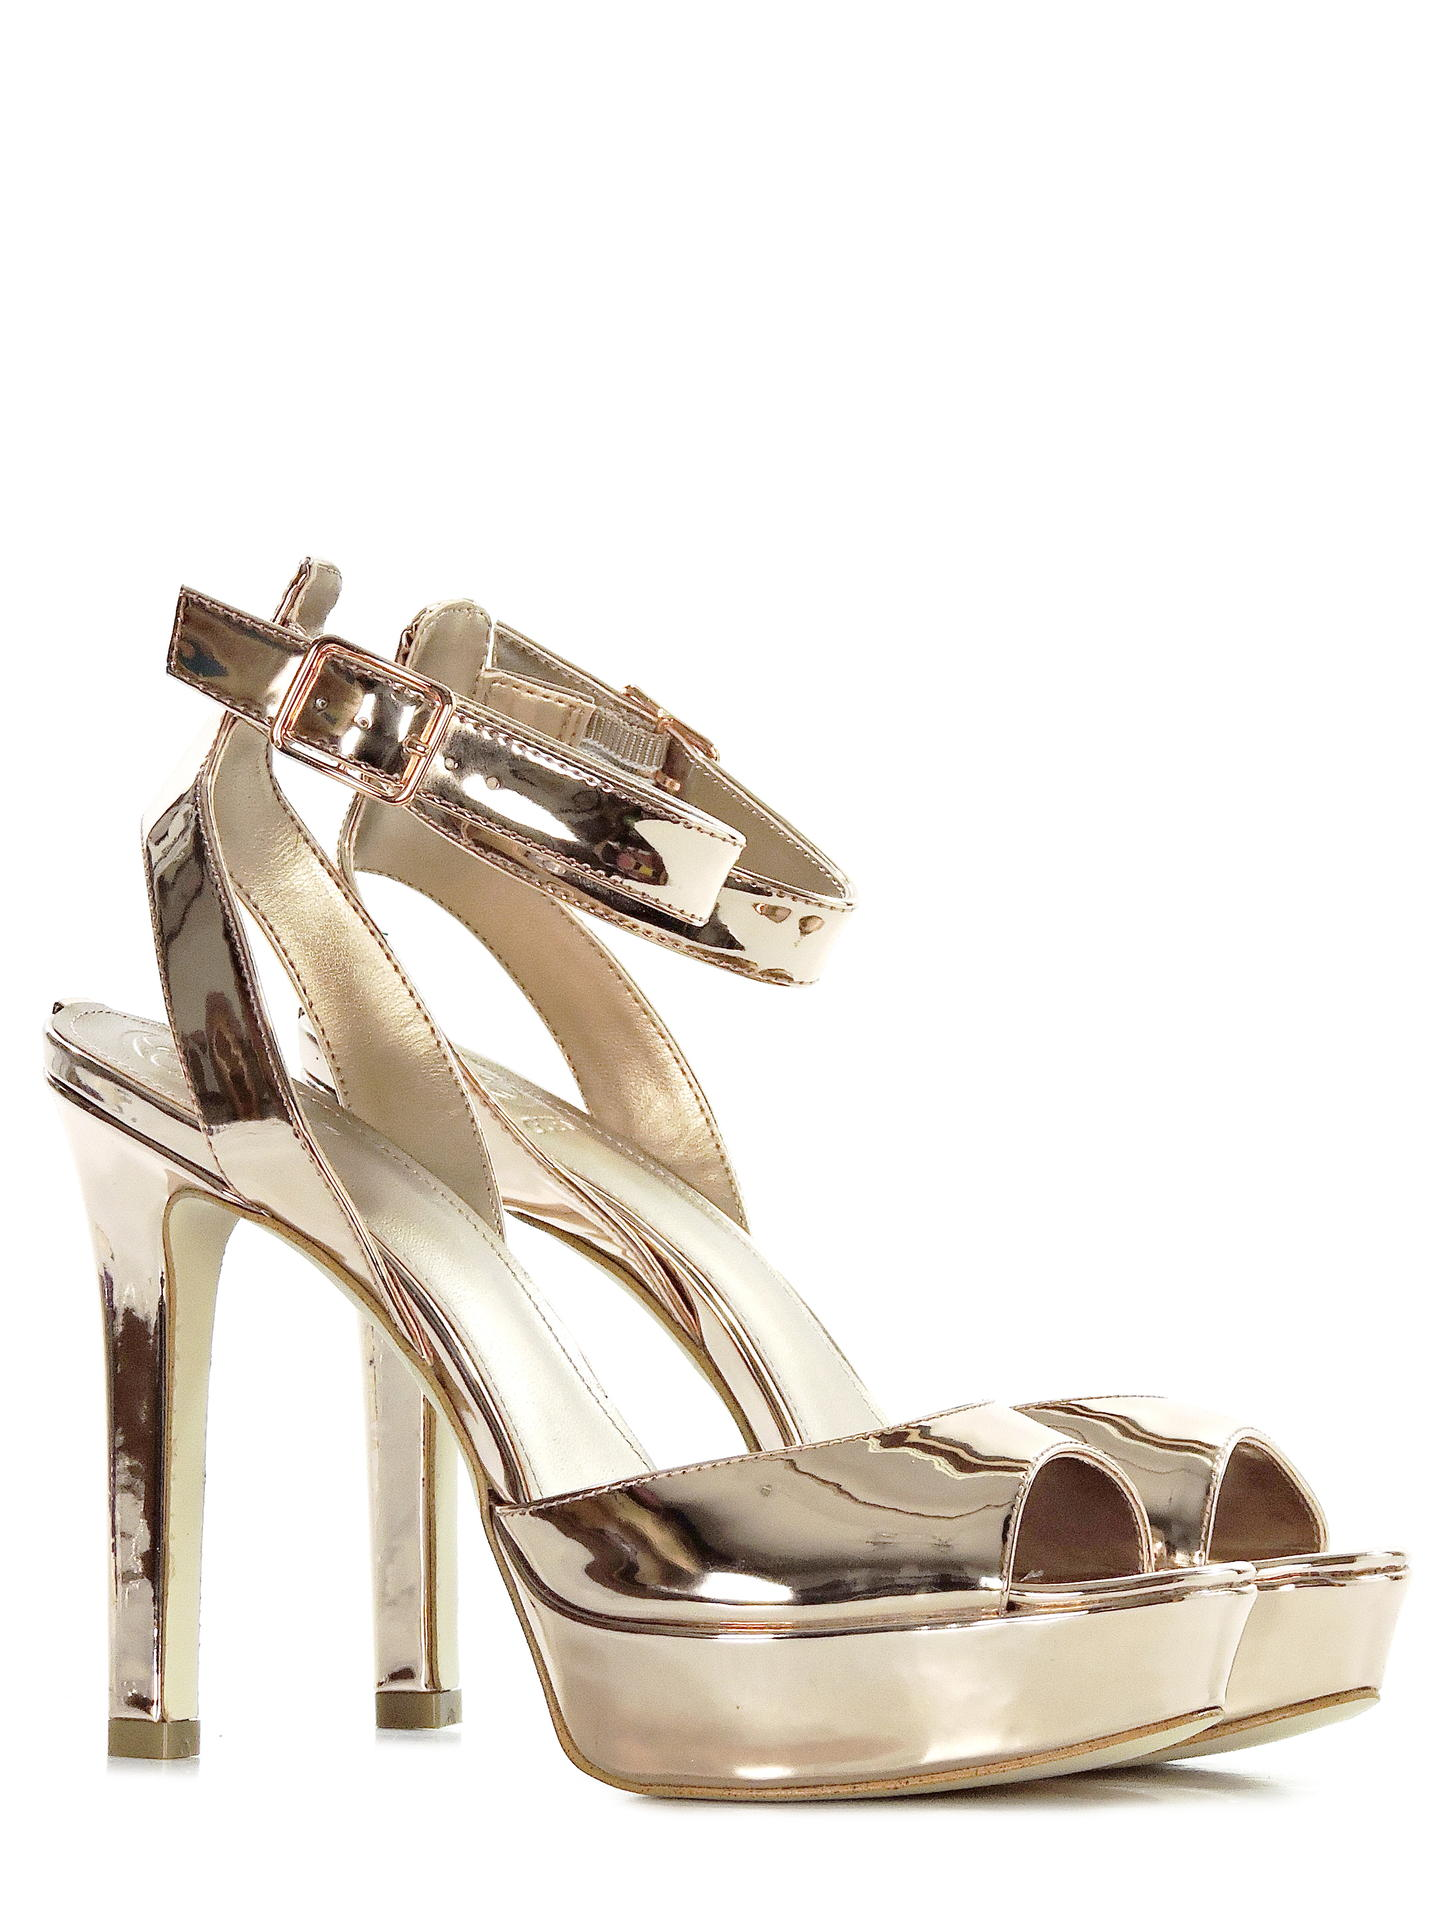 Collection Sandalo Flca41 Jfk1tcl Alto Cipriadesiderio Guess 8n0nmw 8n0OkNwPX